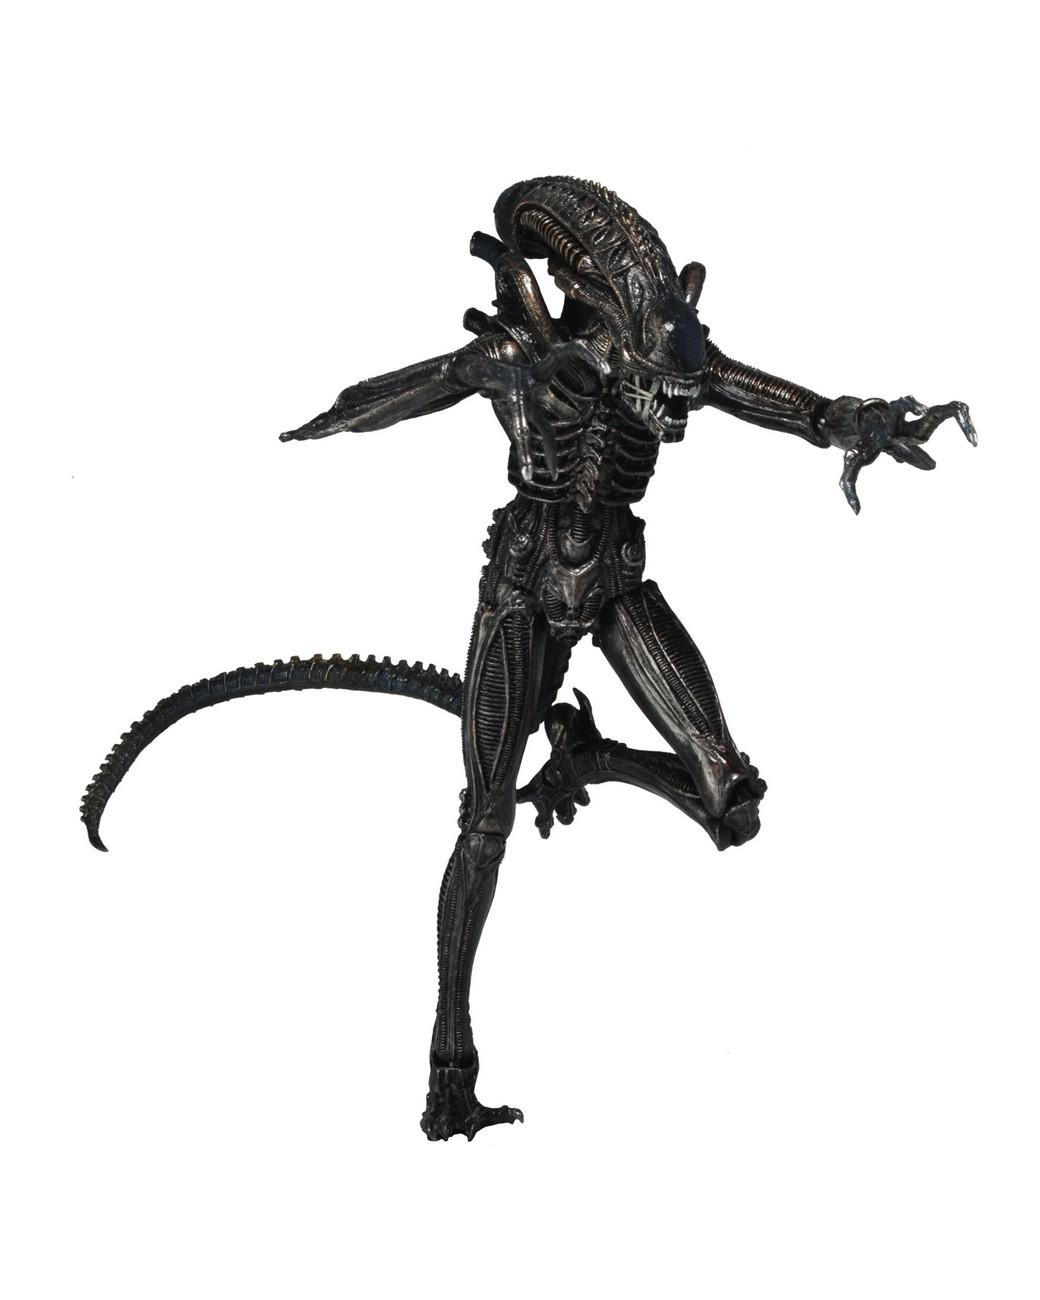 NECA Aliens Series 5 (Ripley, Bishop, Warriors, Power Loader